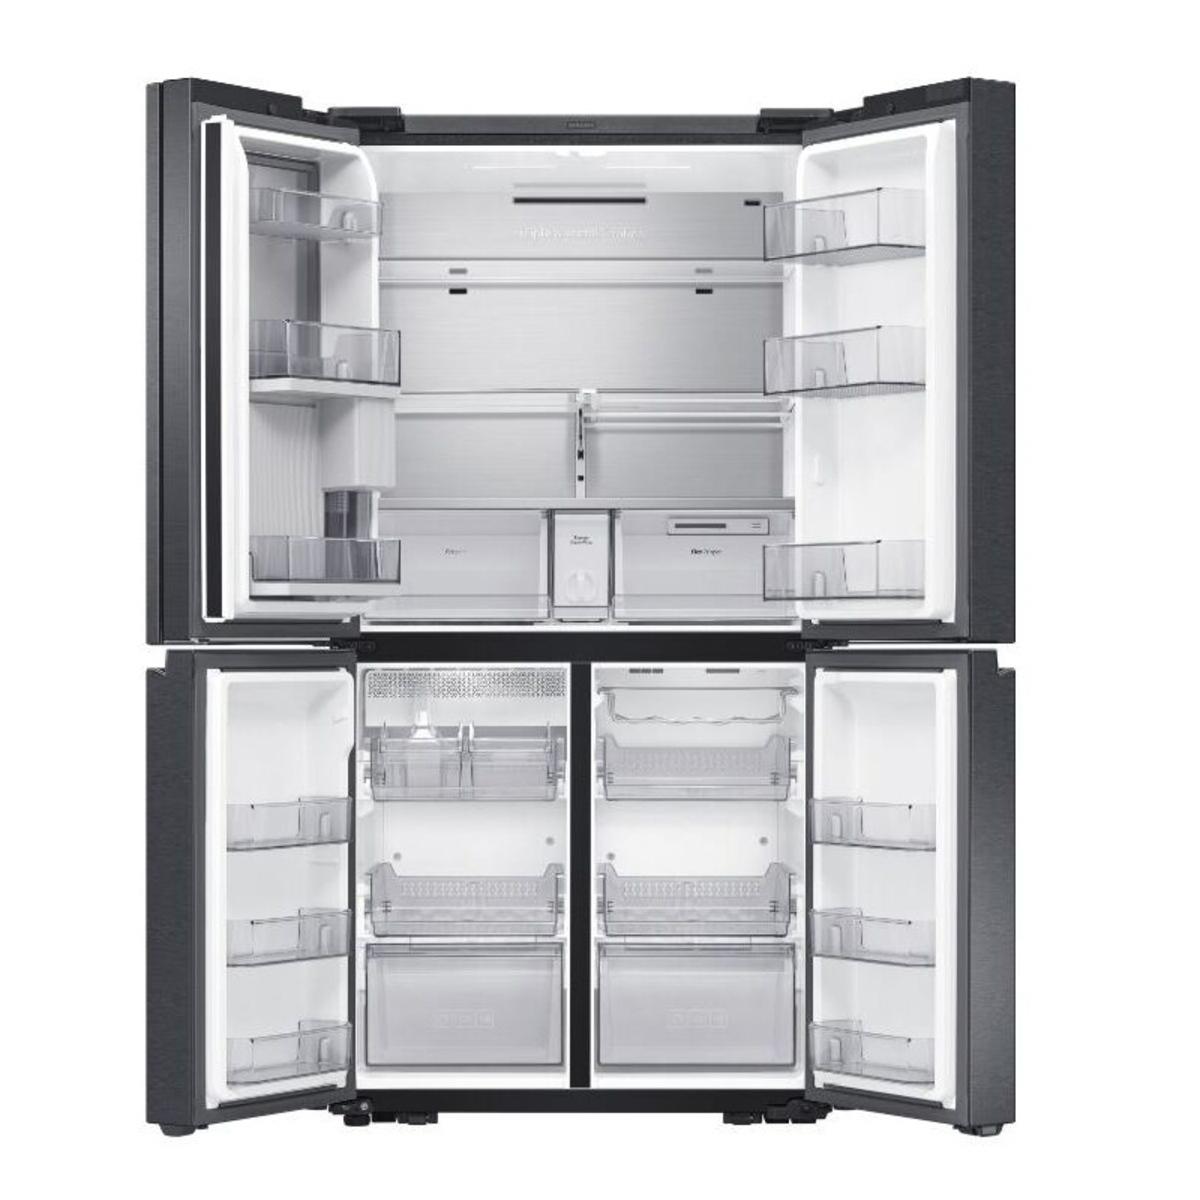 Samsung RF65A977FB1 French Door Family Hub Fridge Freezer, Black